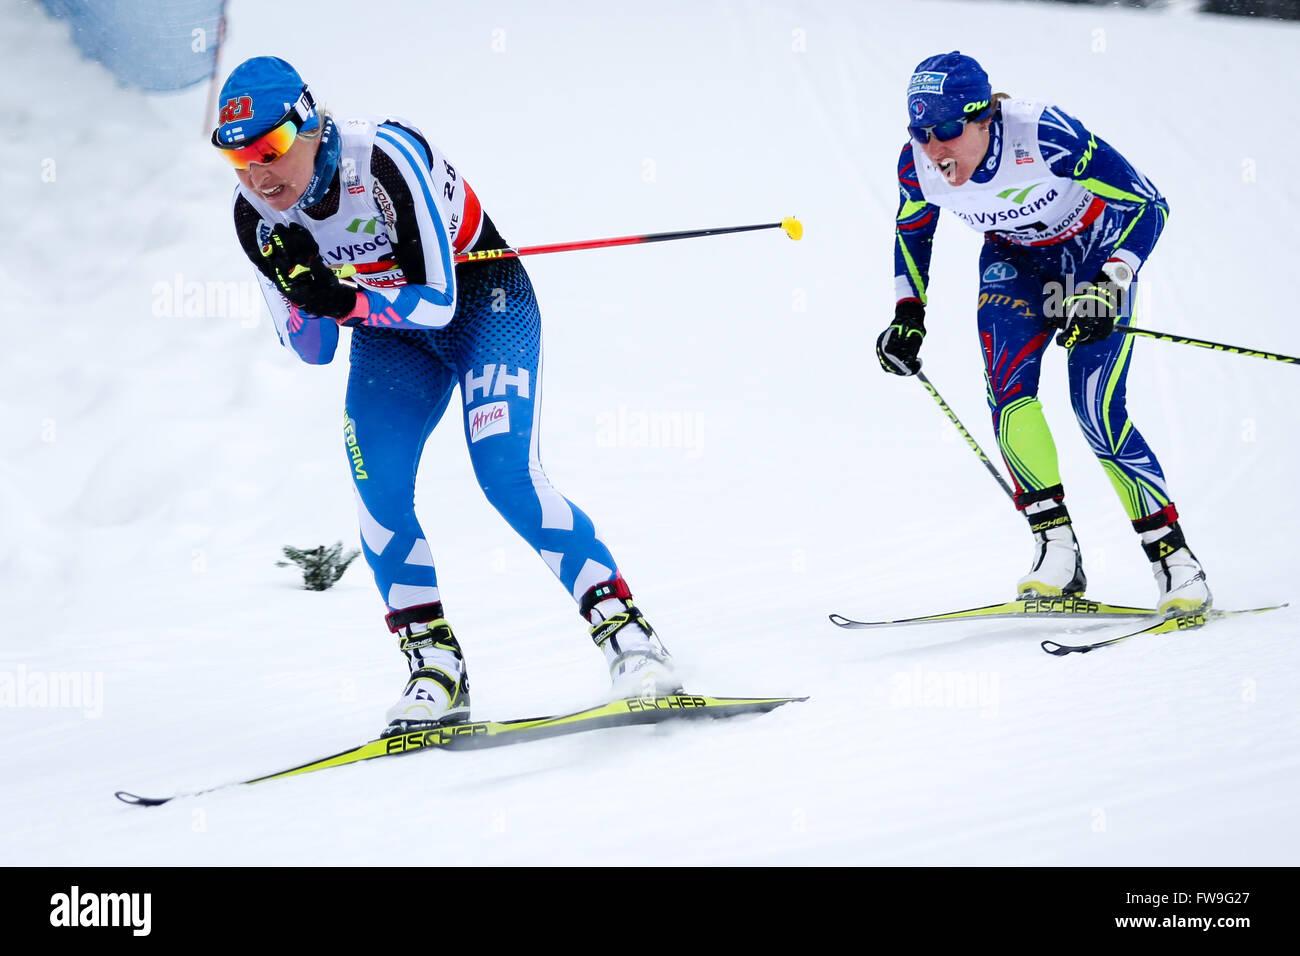 Nove Mesto na Morave, Czech Republic - January 23, 2016: FIS Cross Country World Cup, women 10km. - Stock Image